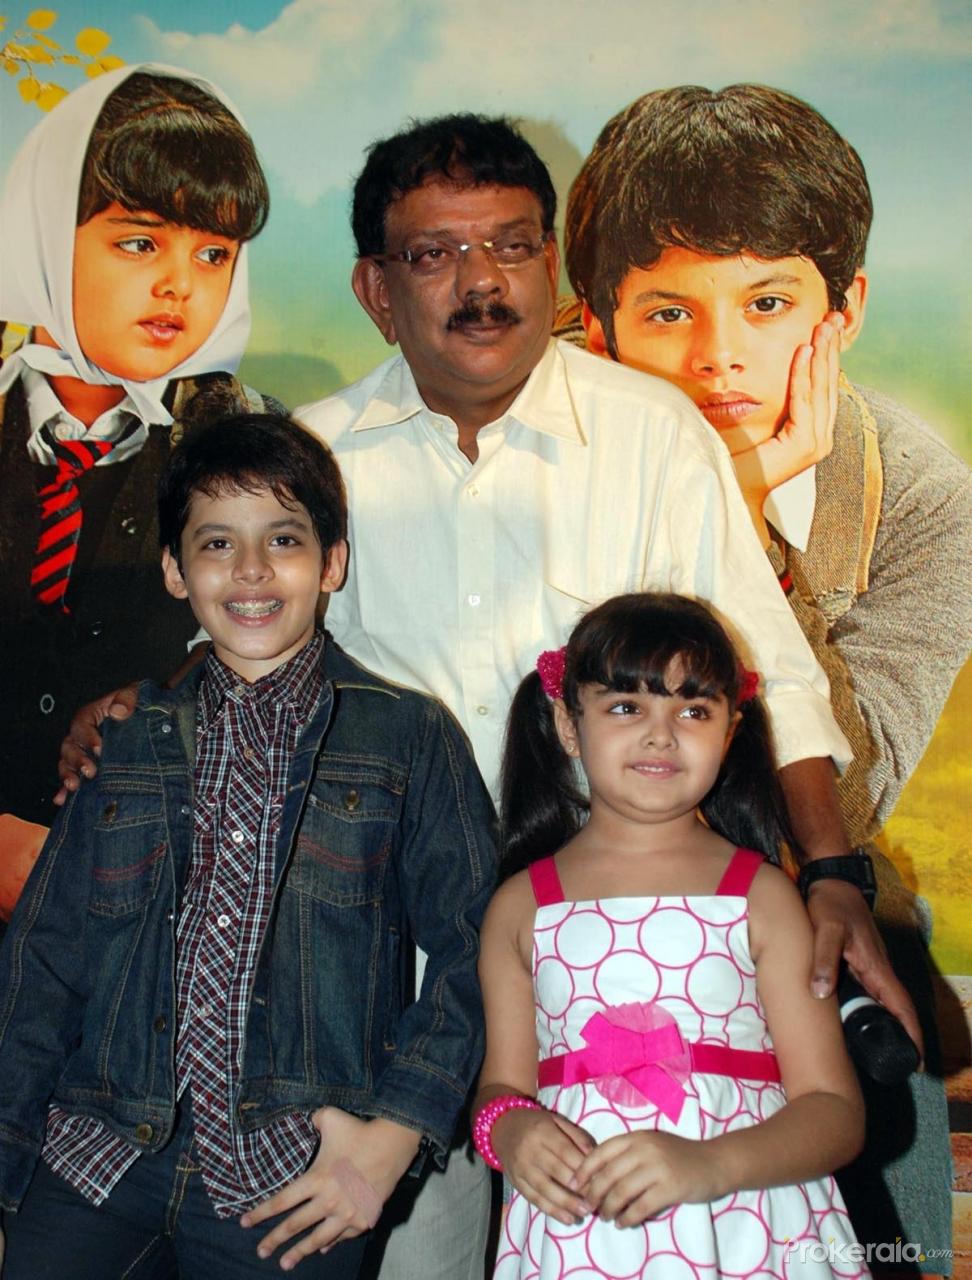 Zaynah Vastani Safary and ziyah vastaniZaynah And Ziyah Vastani